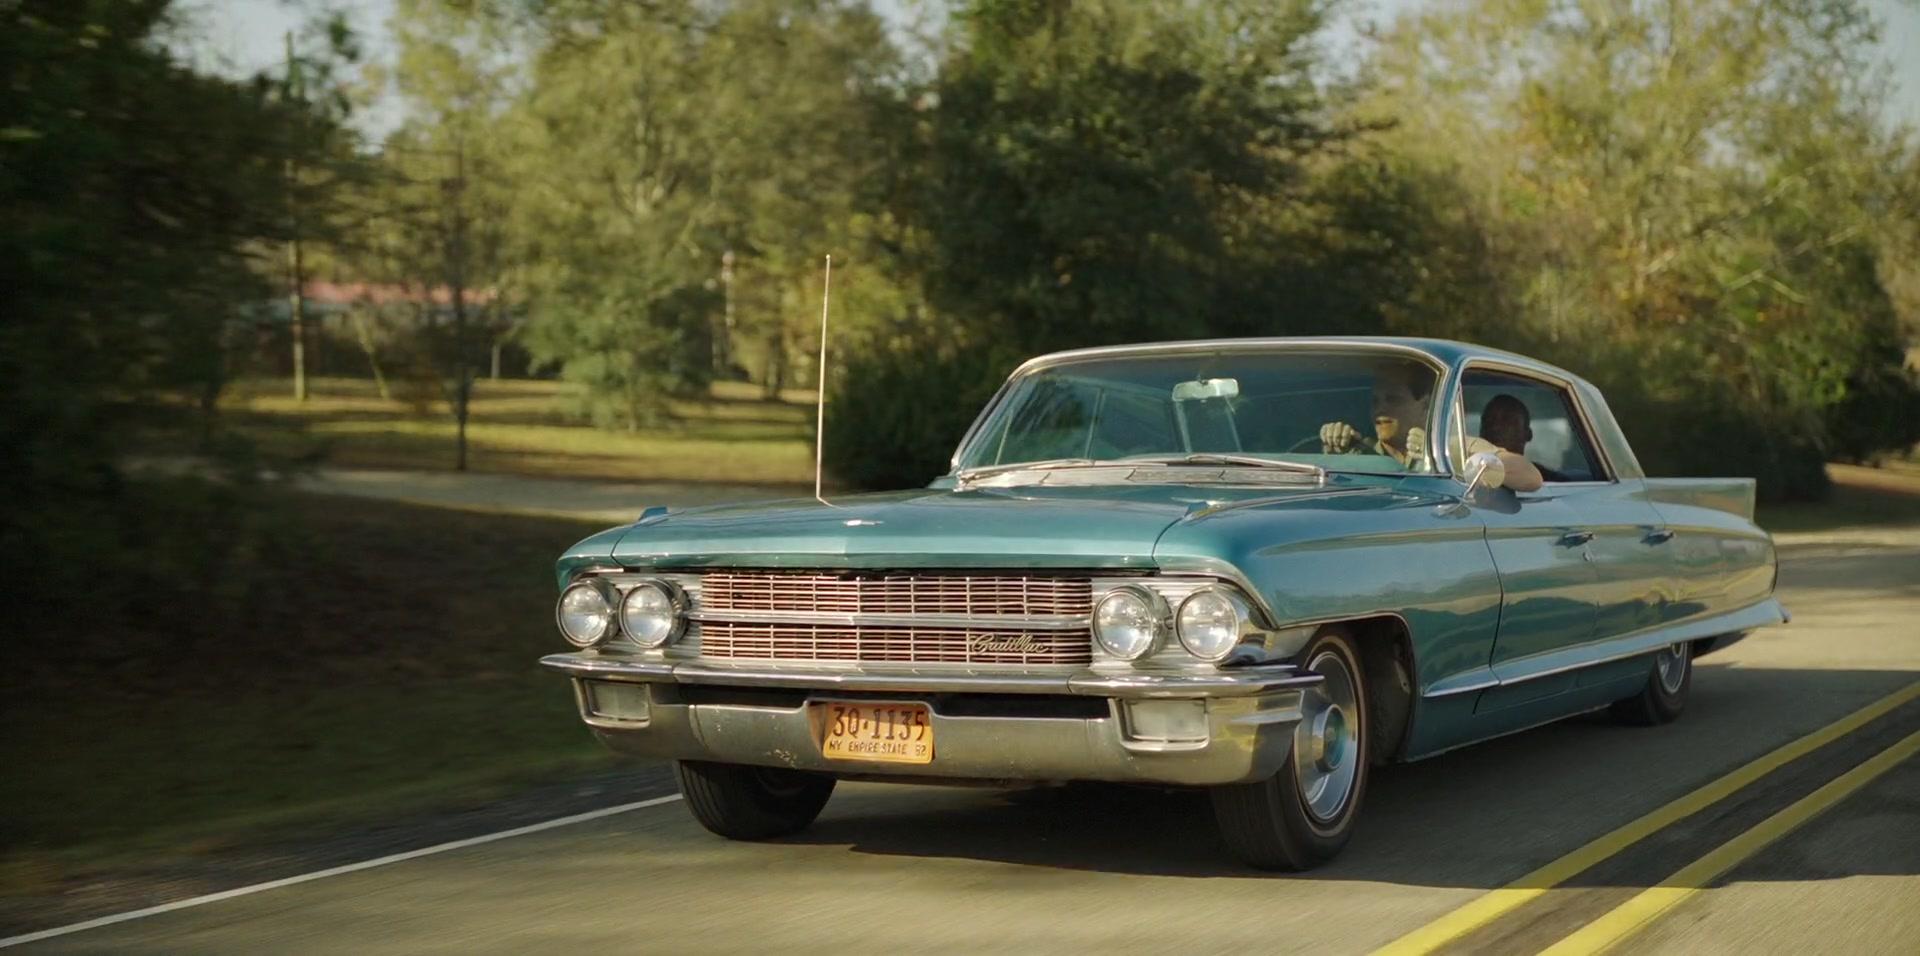 List Of Car Brands >> Cadillac Car in Green Book (2018) Movie